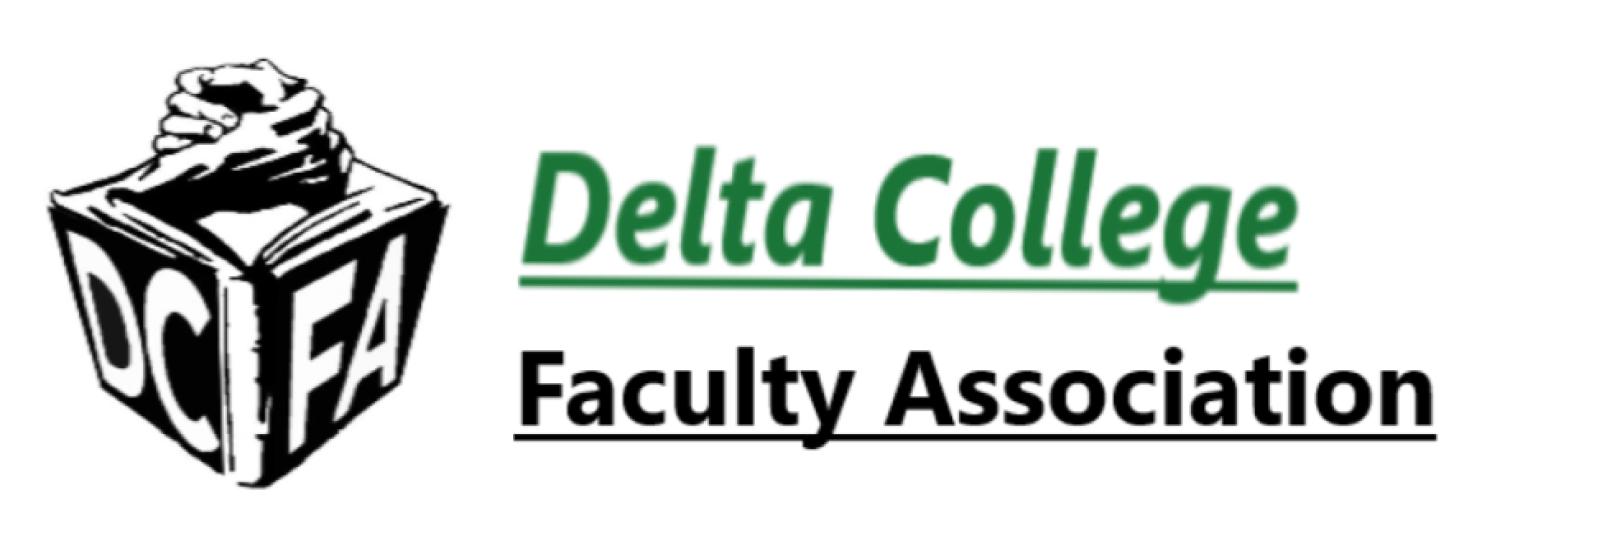 Delta College Faculty Association